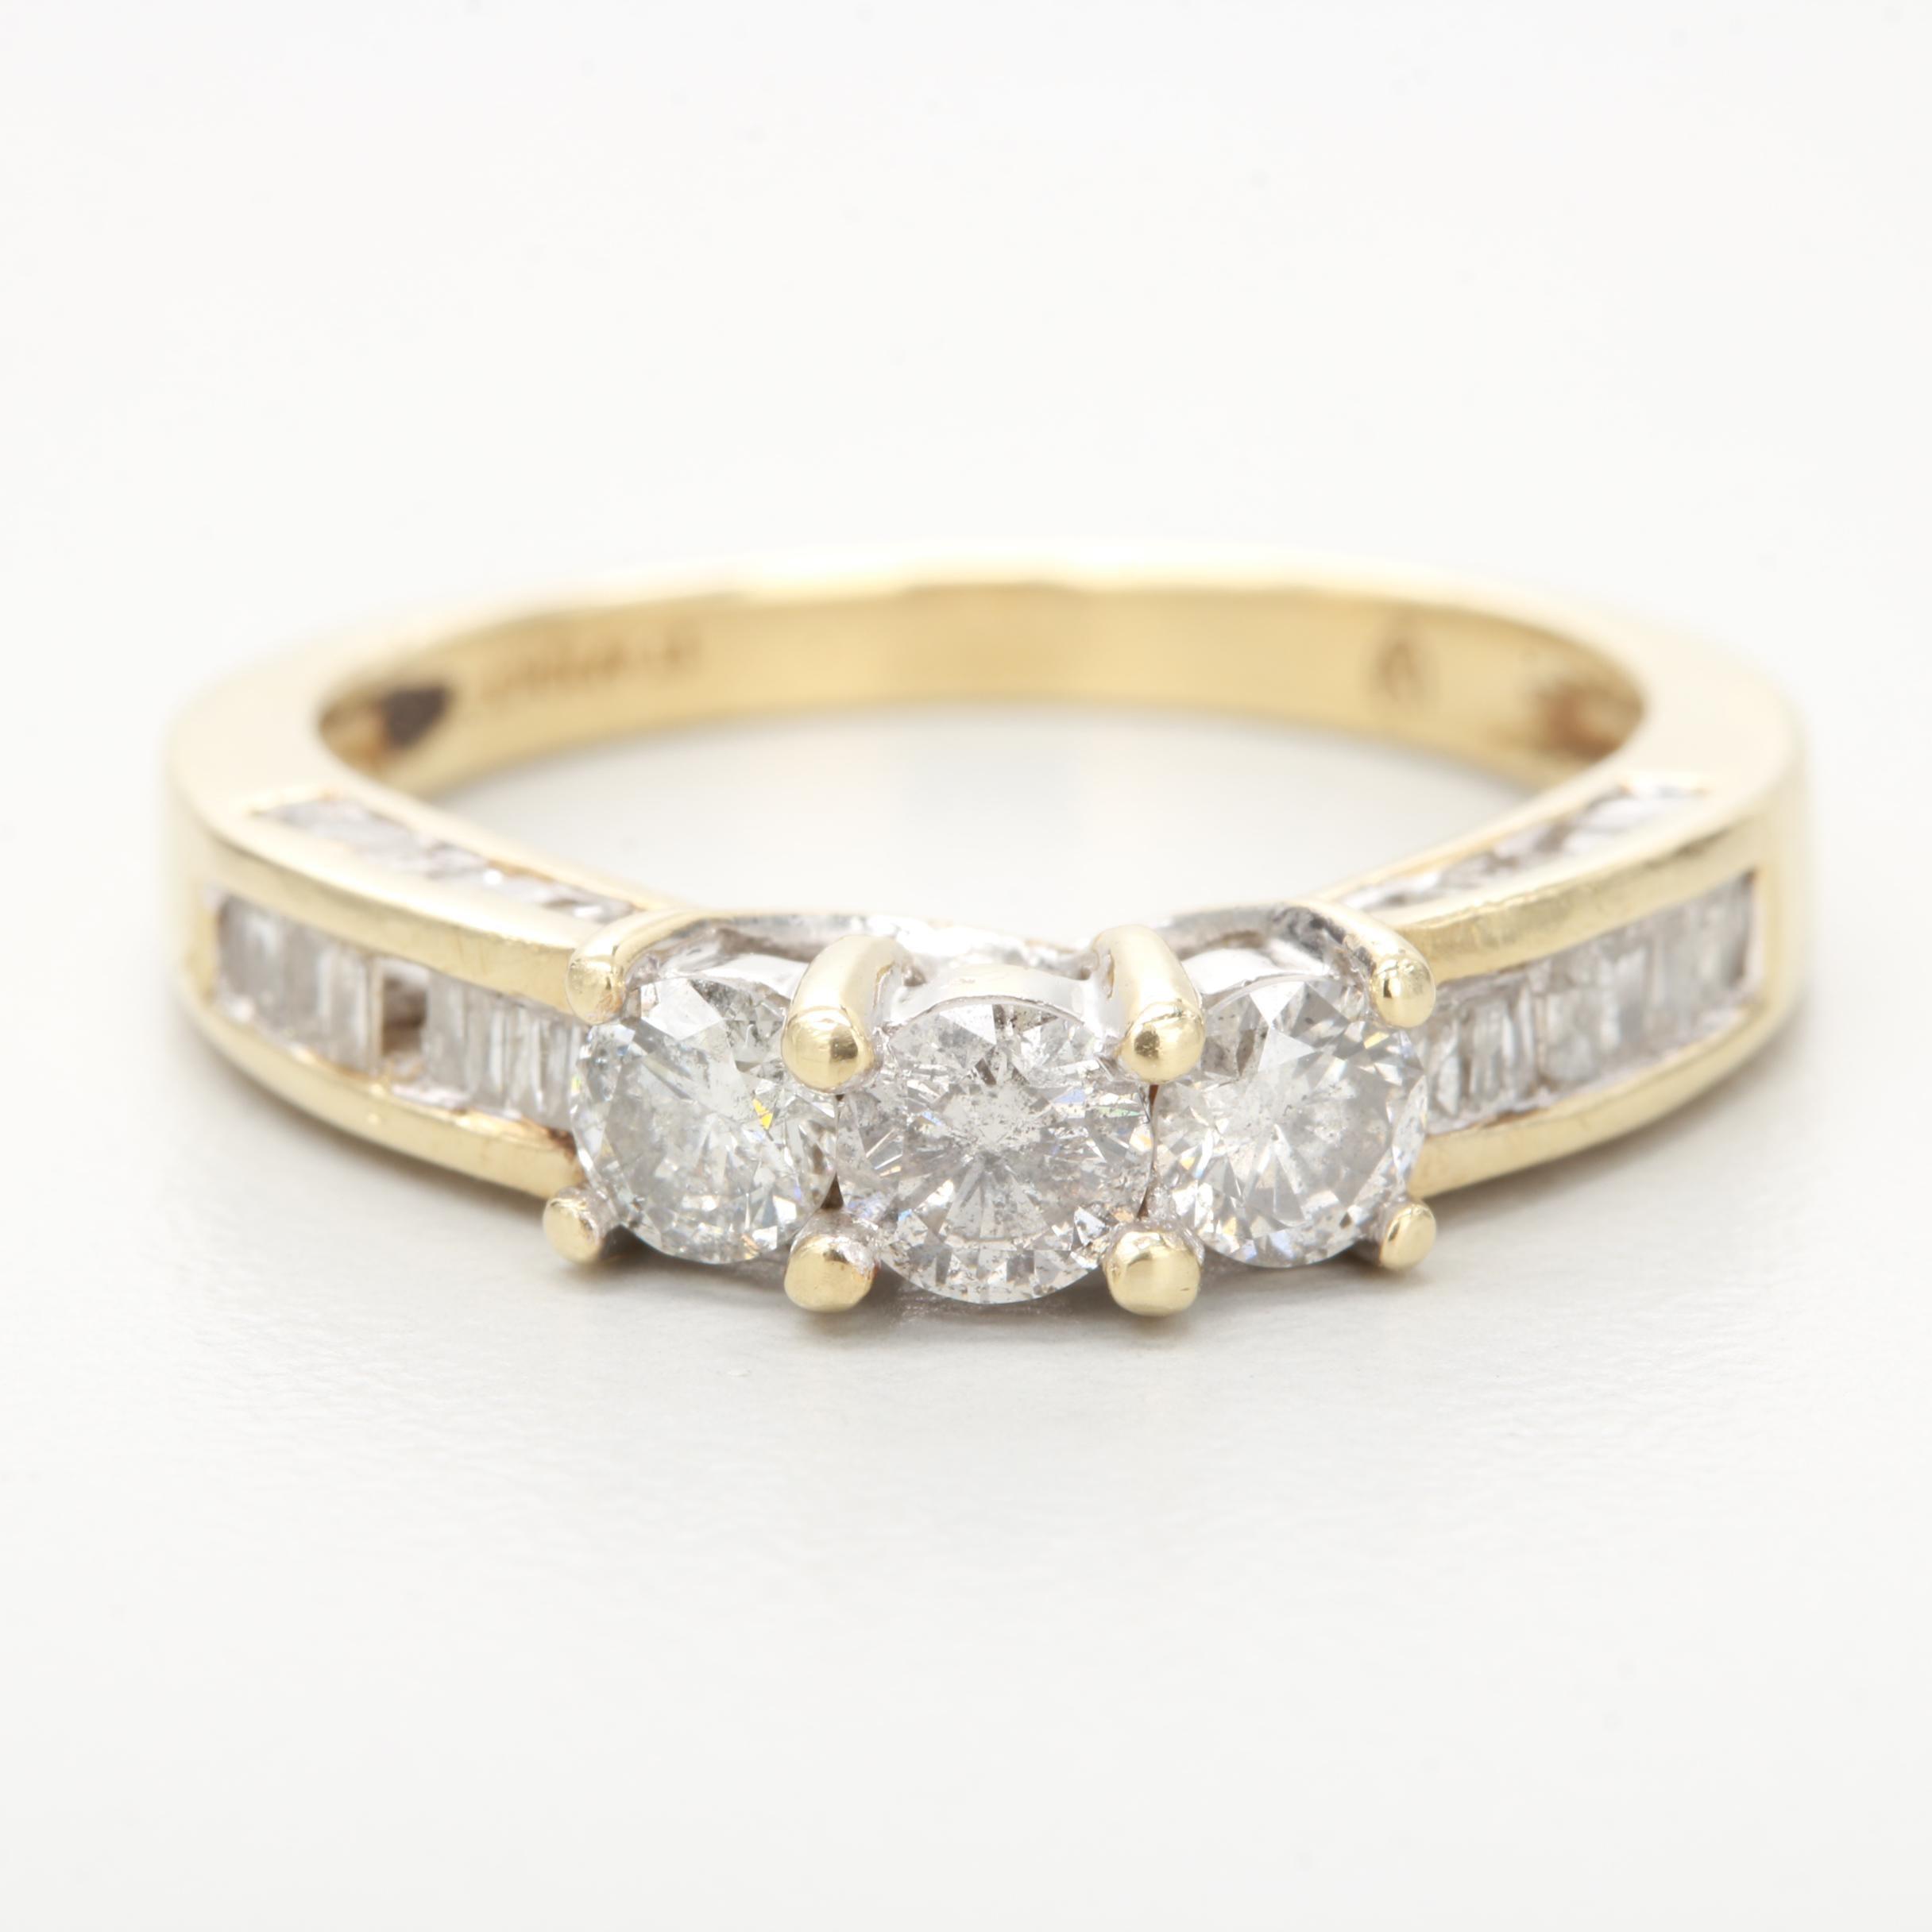 10K Yellow Gold 1.00 CTW Diamond Ring